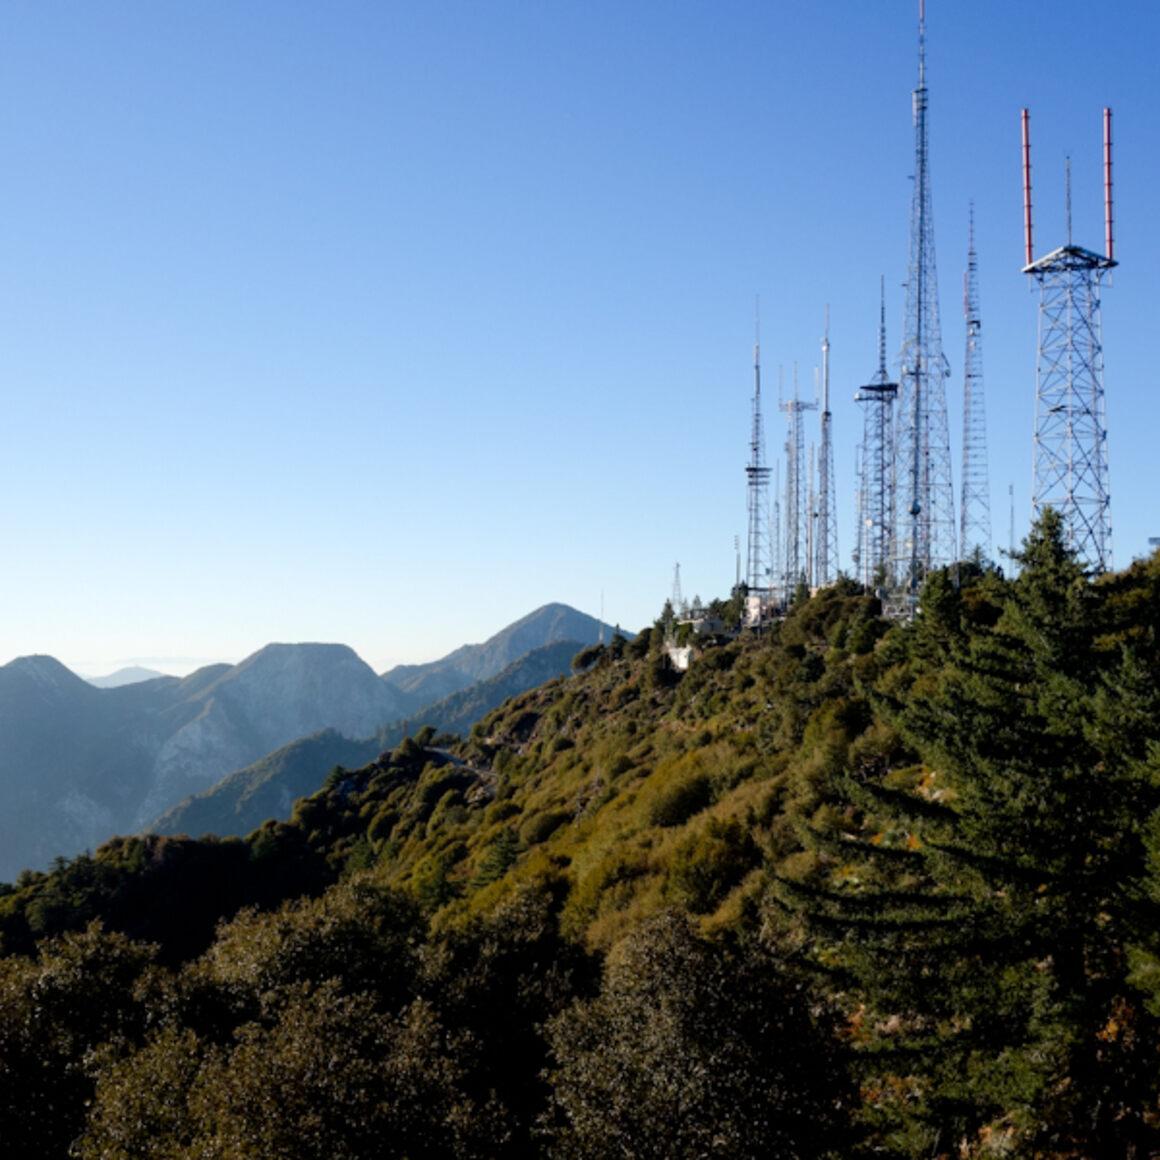 Radio Ridge antenna farm on the way to the observatory.